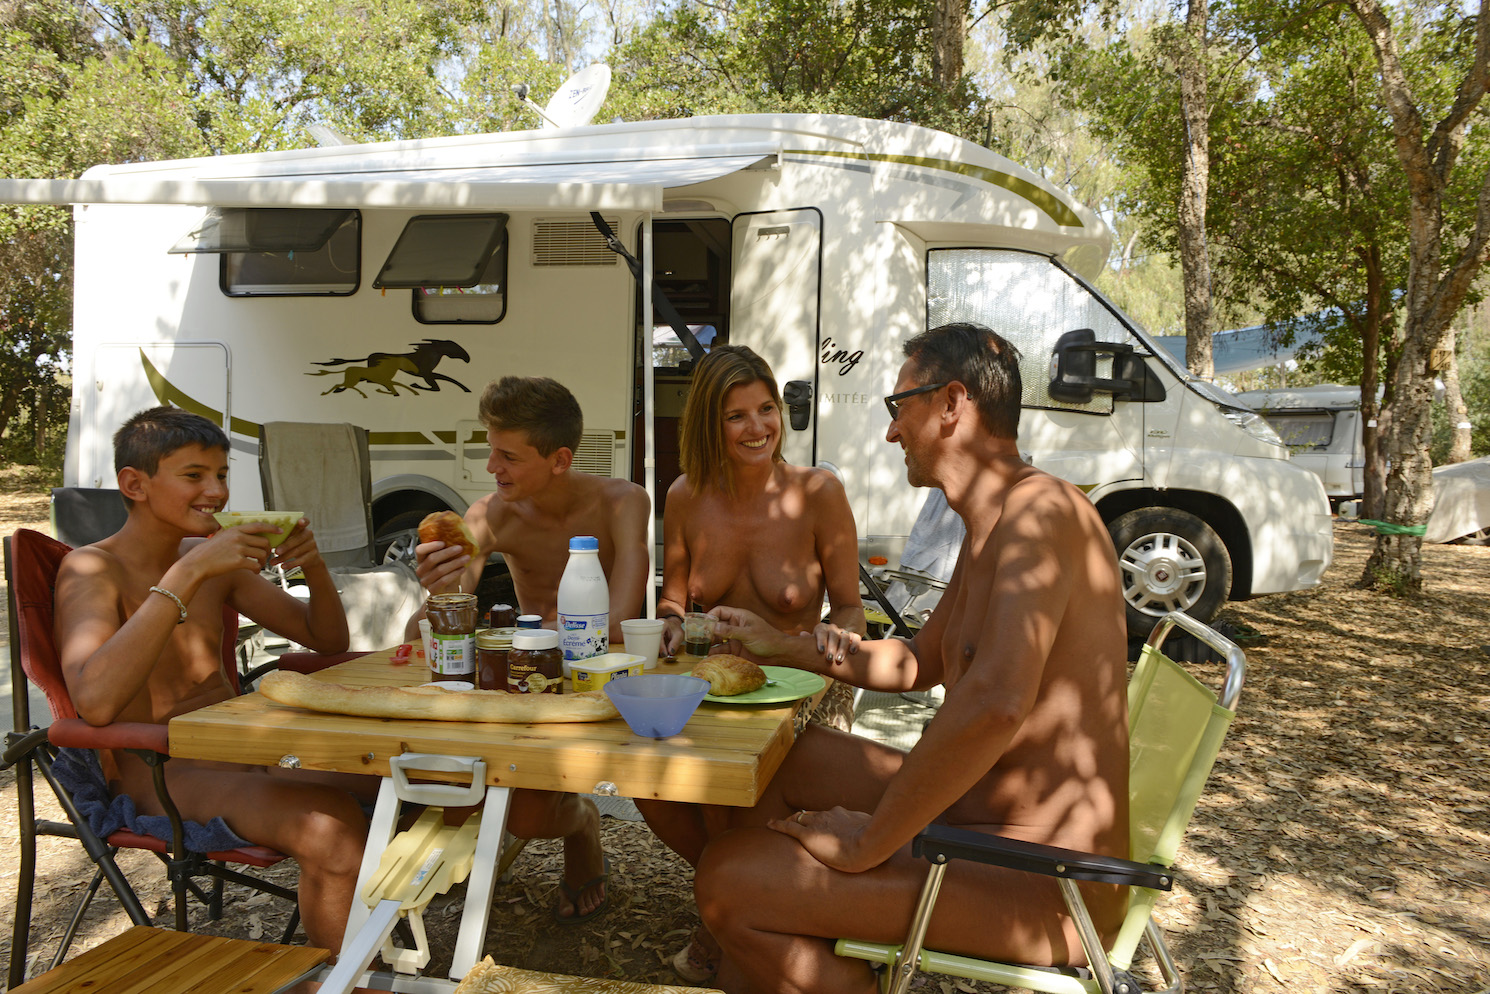 Nudist camping video